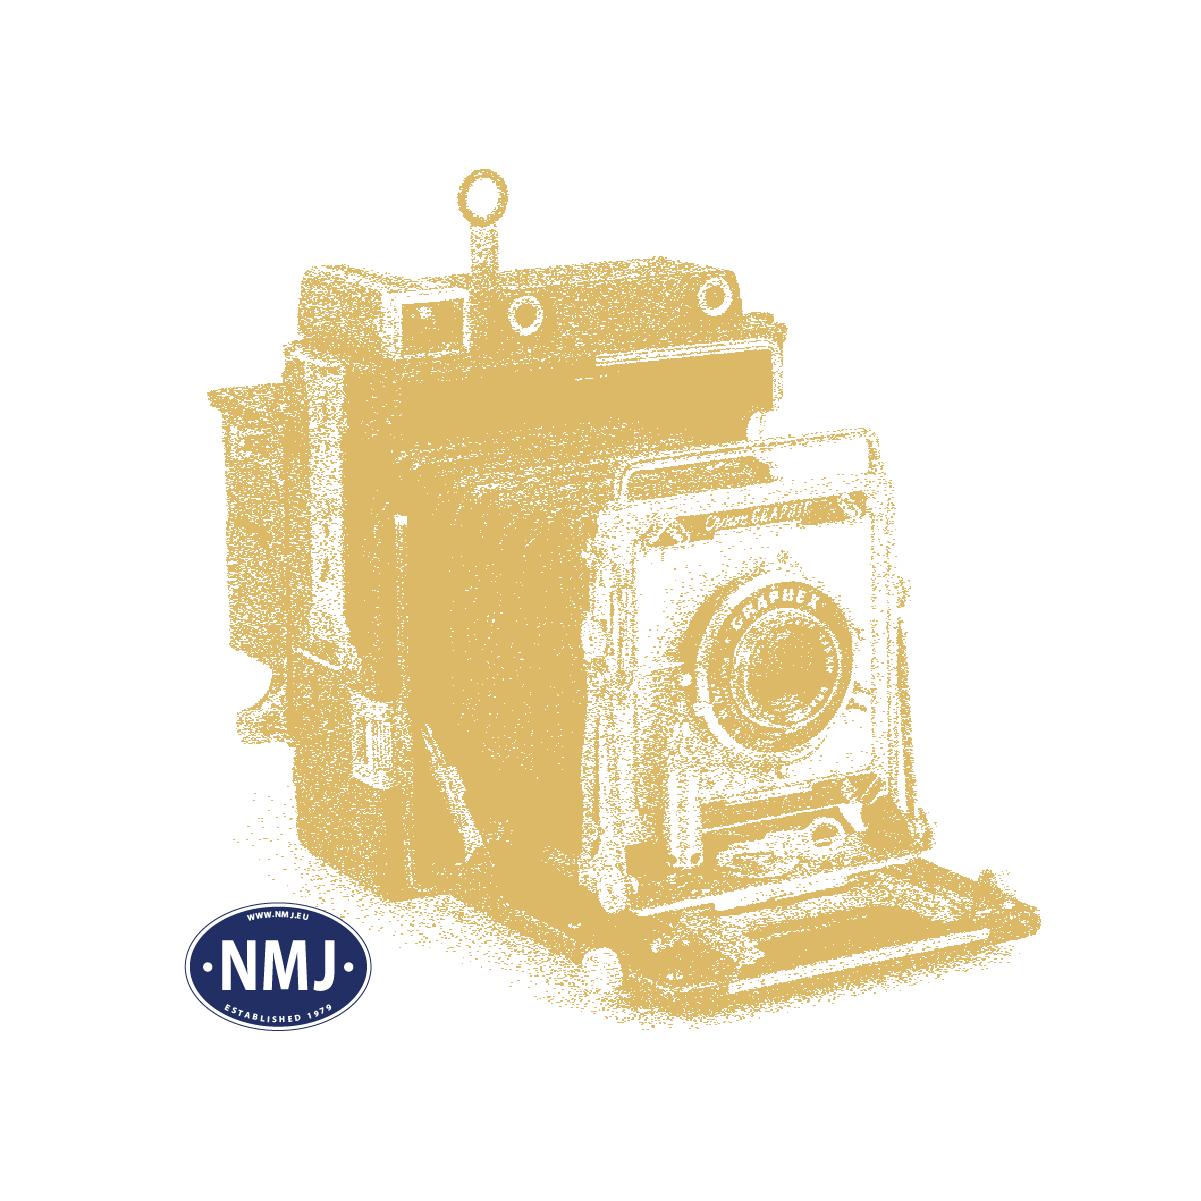 NMJT131.304 - NMJ Topline NSB B3-2 Type 3 25522, Nydesign